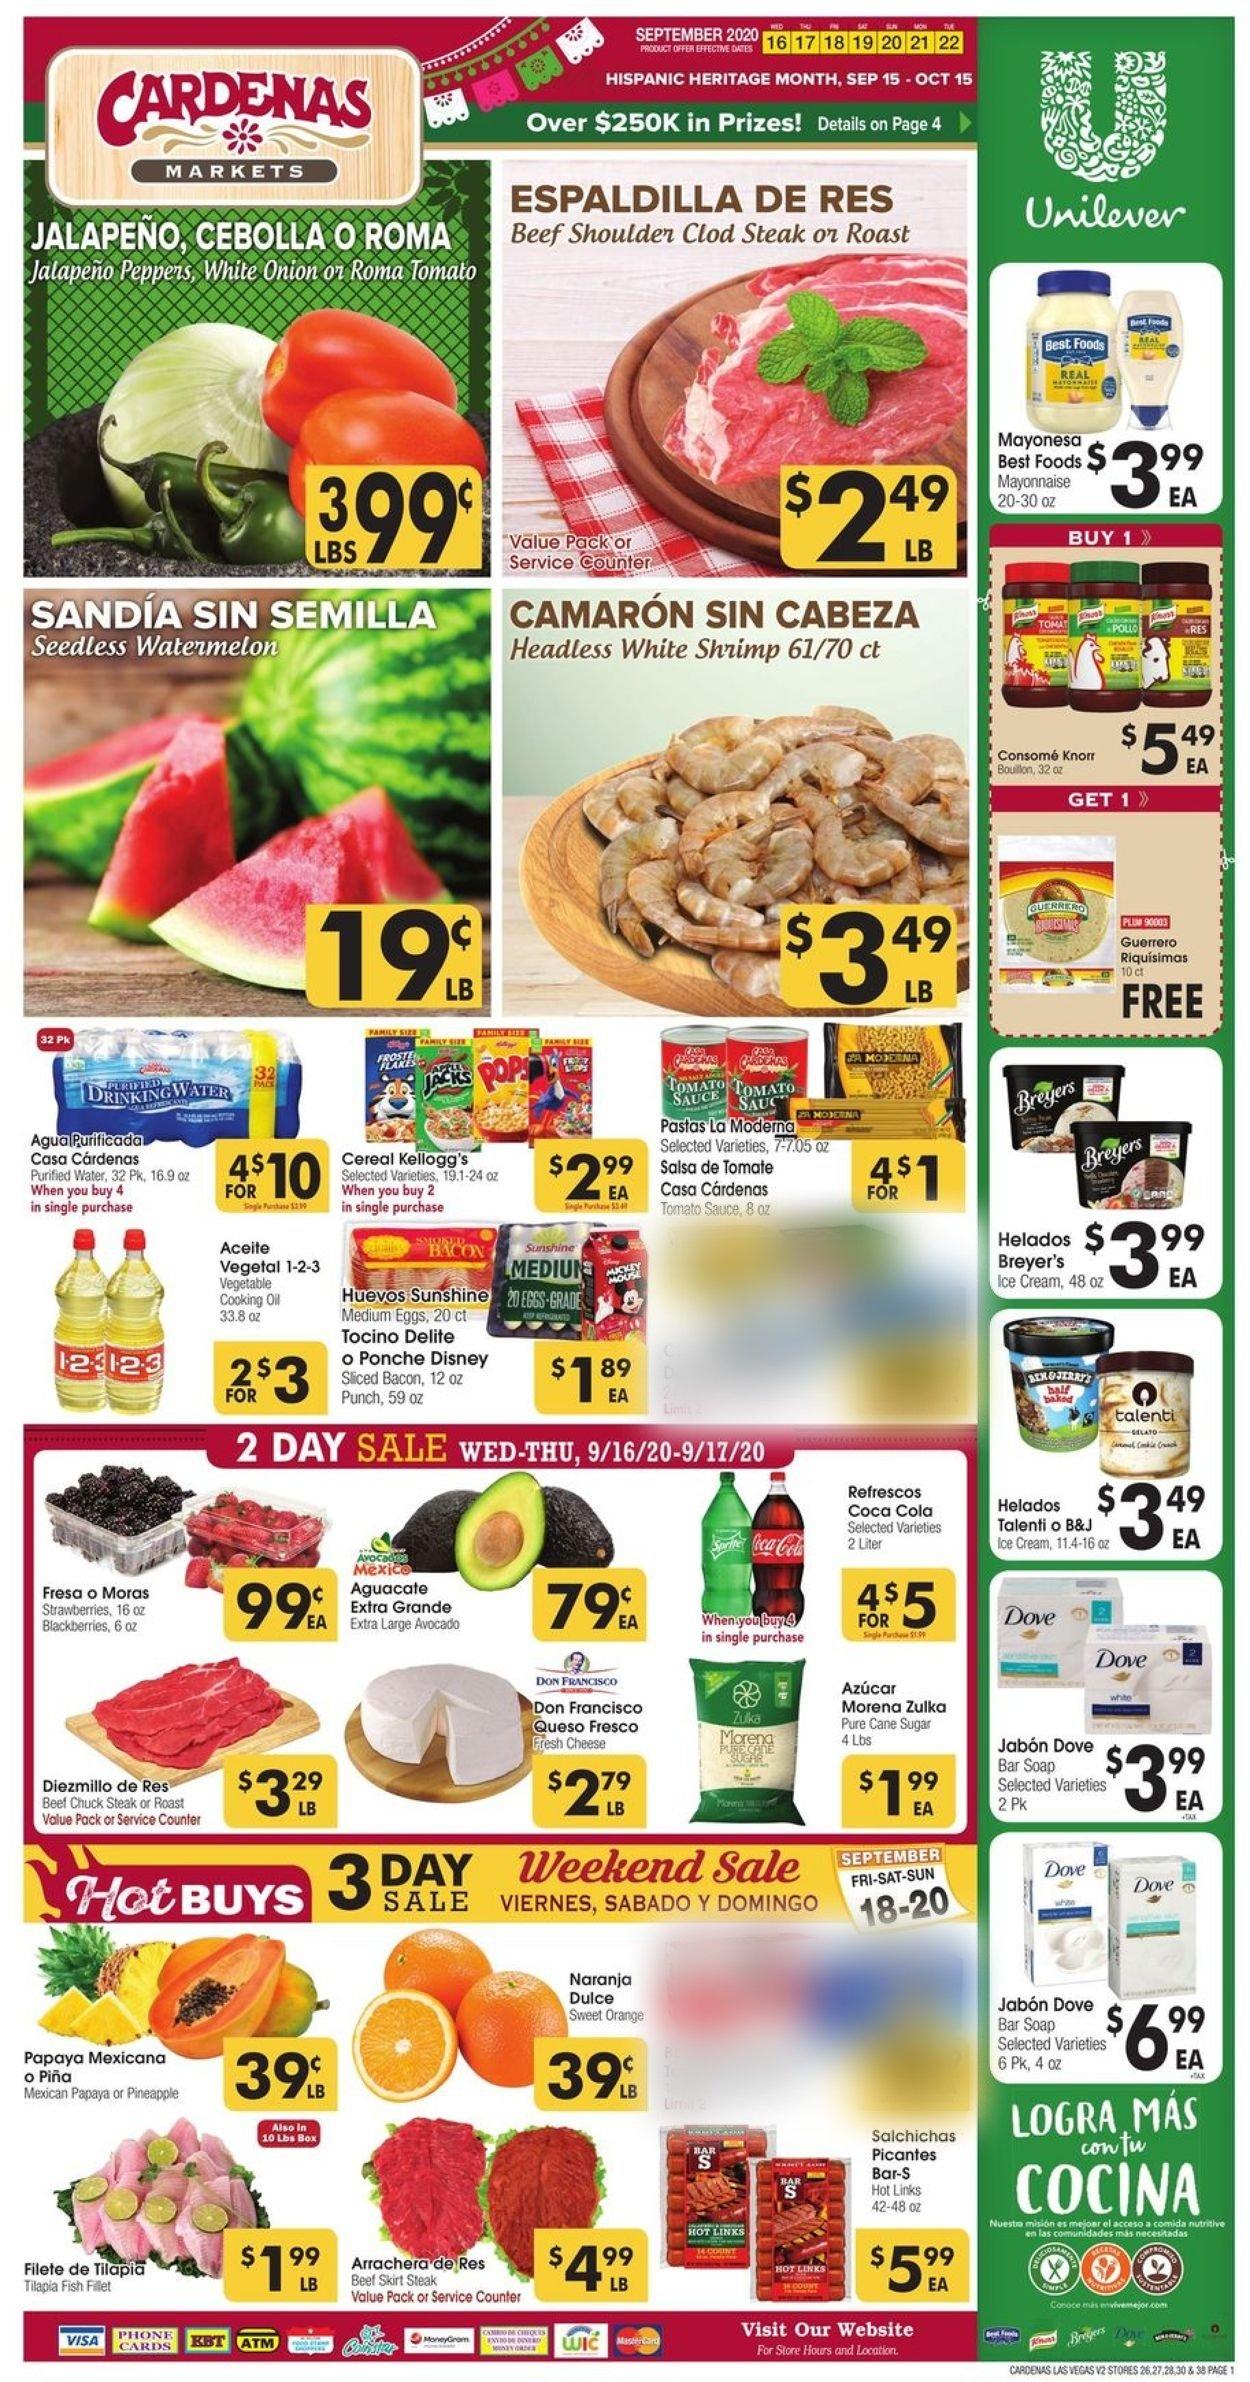 Cardenas Weekly Ad Circular - valid 09/16-09/22/2020